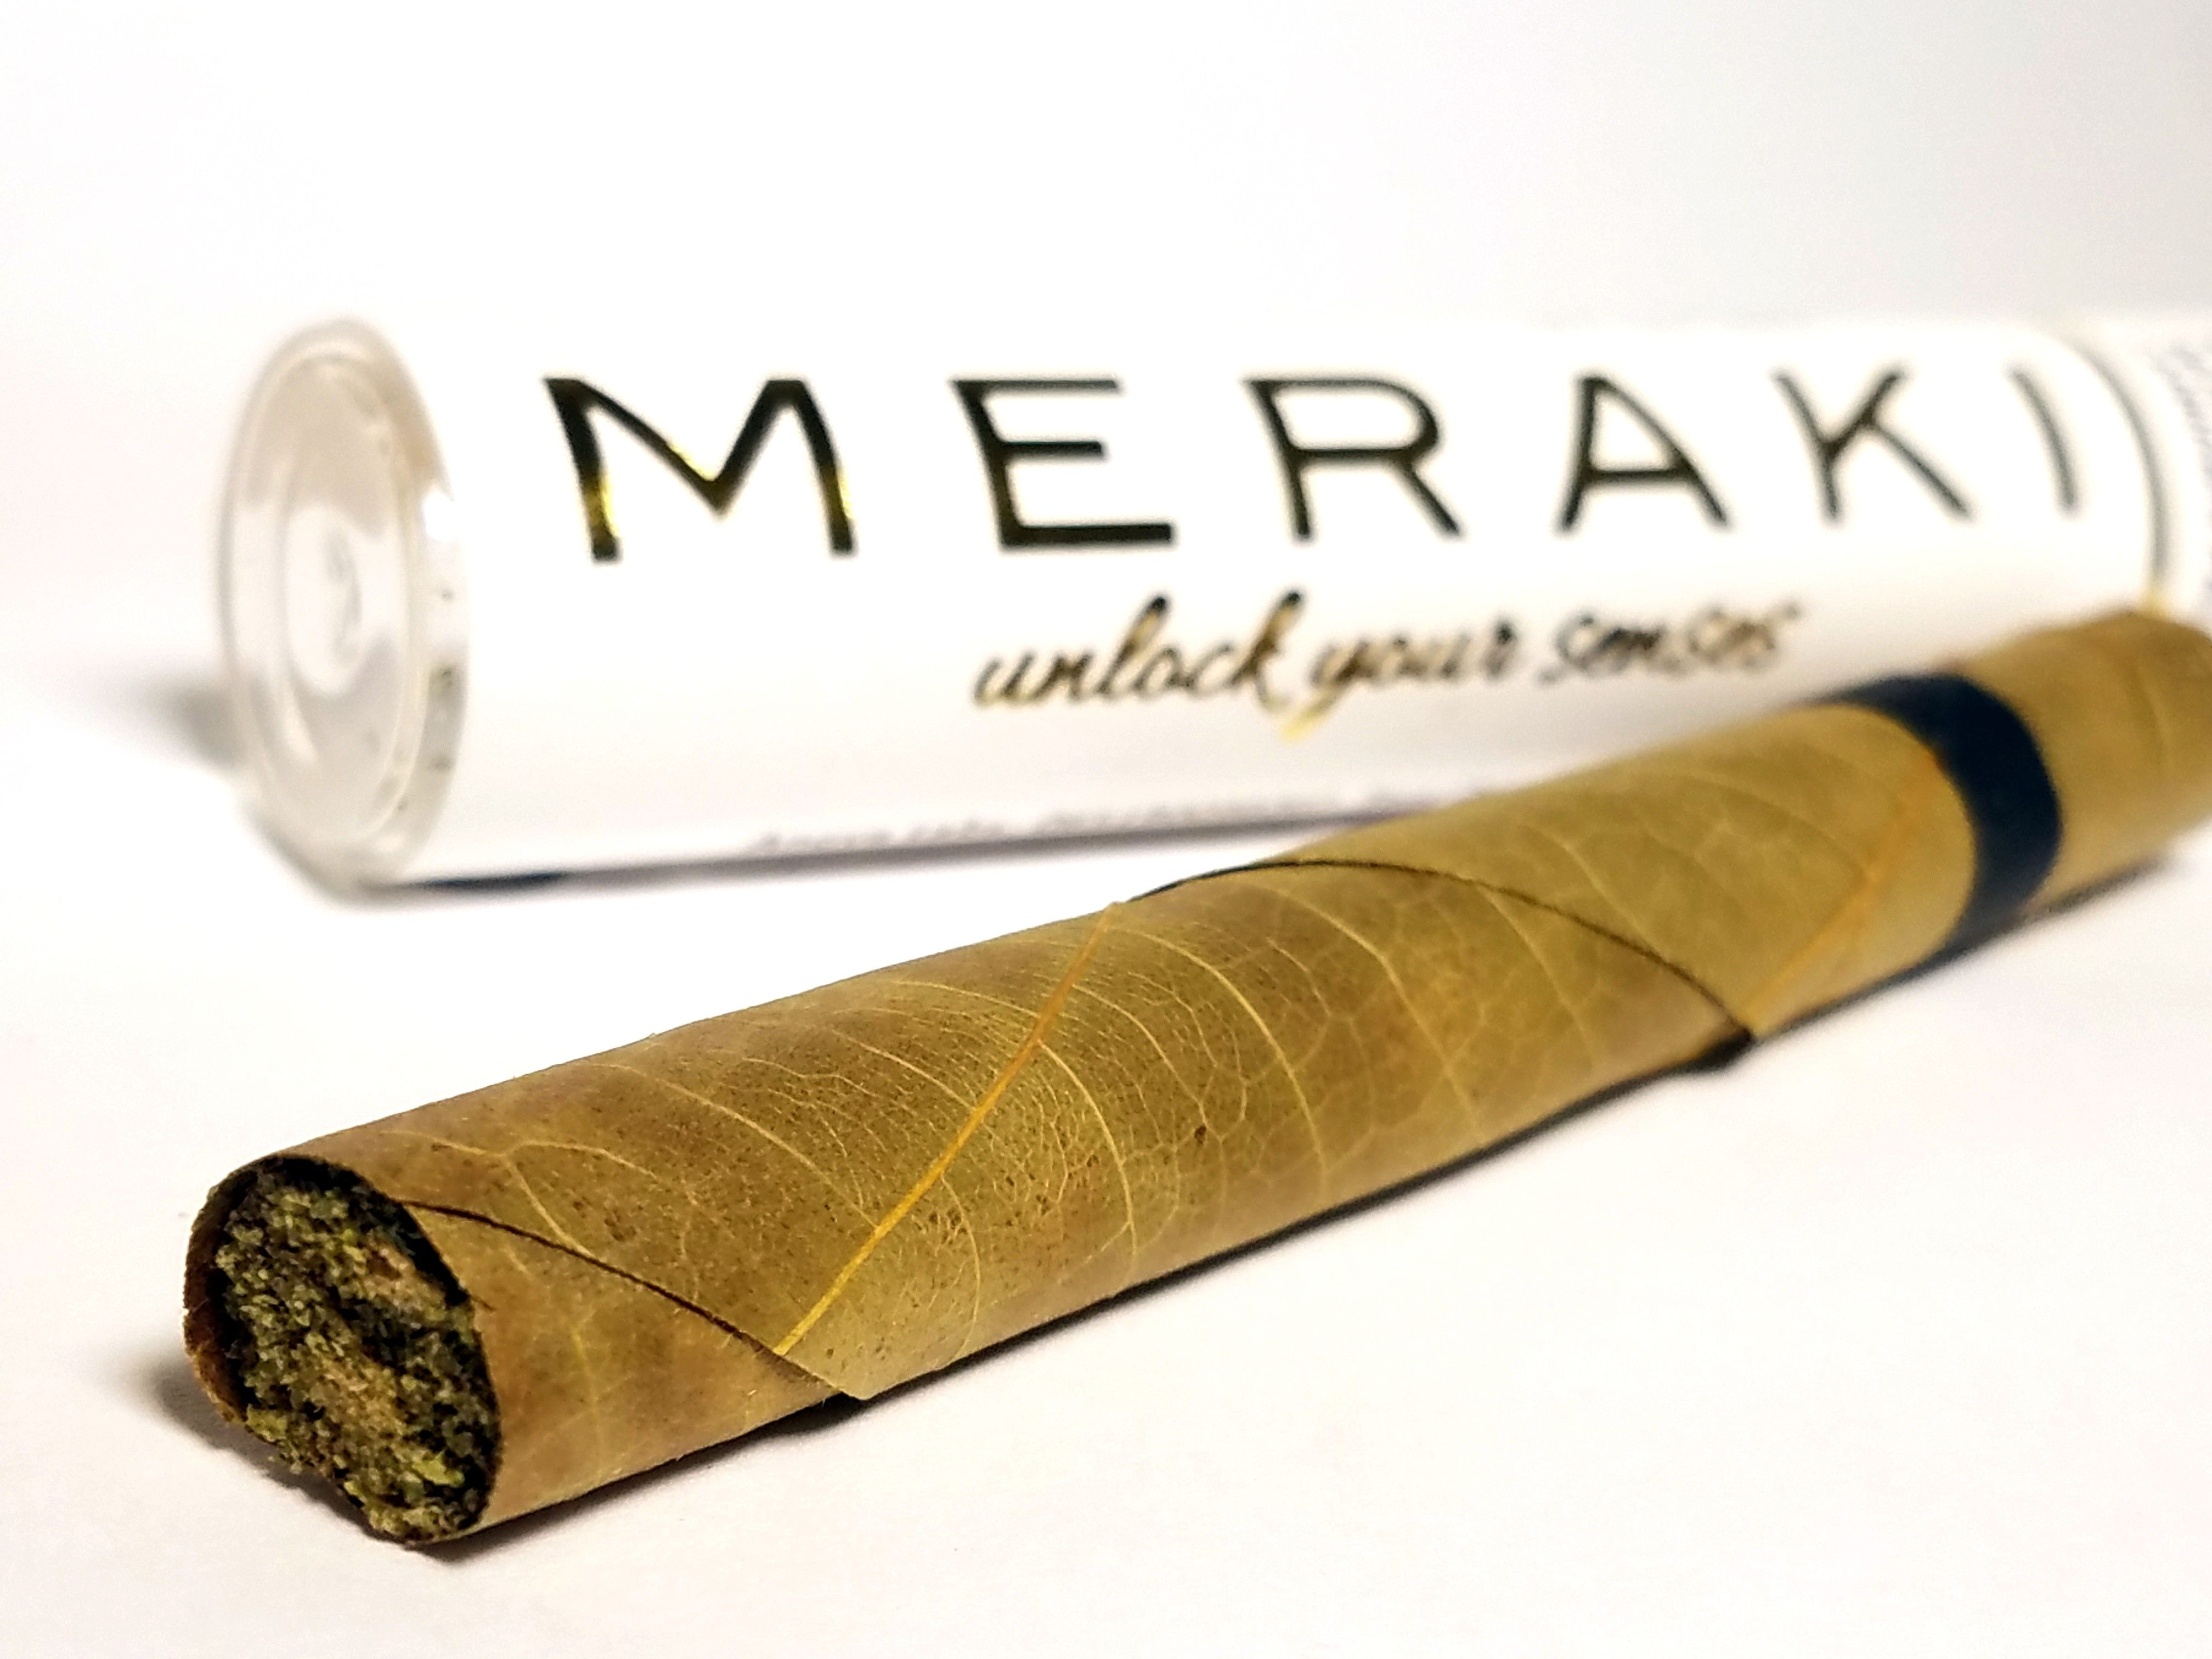 Meraki Gardens - Meraki Mango 1.5g, Sativa, Palm